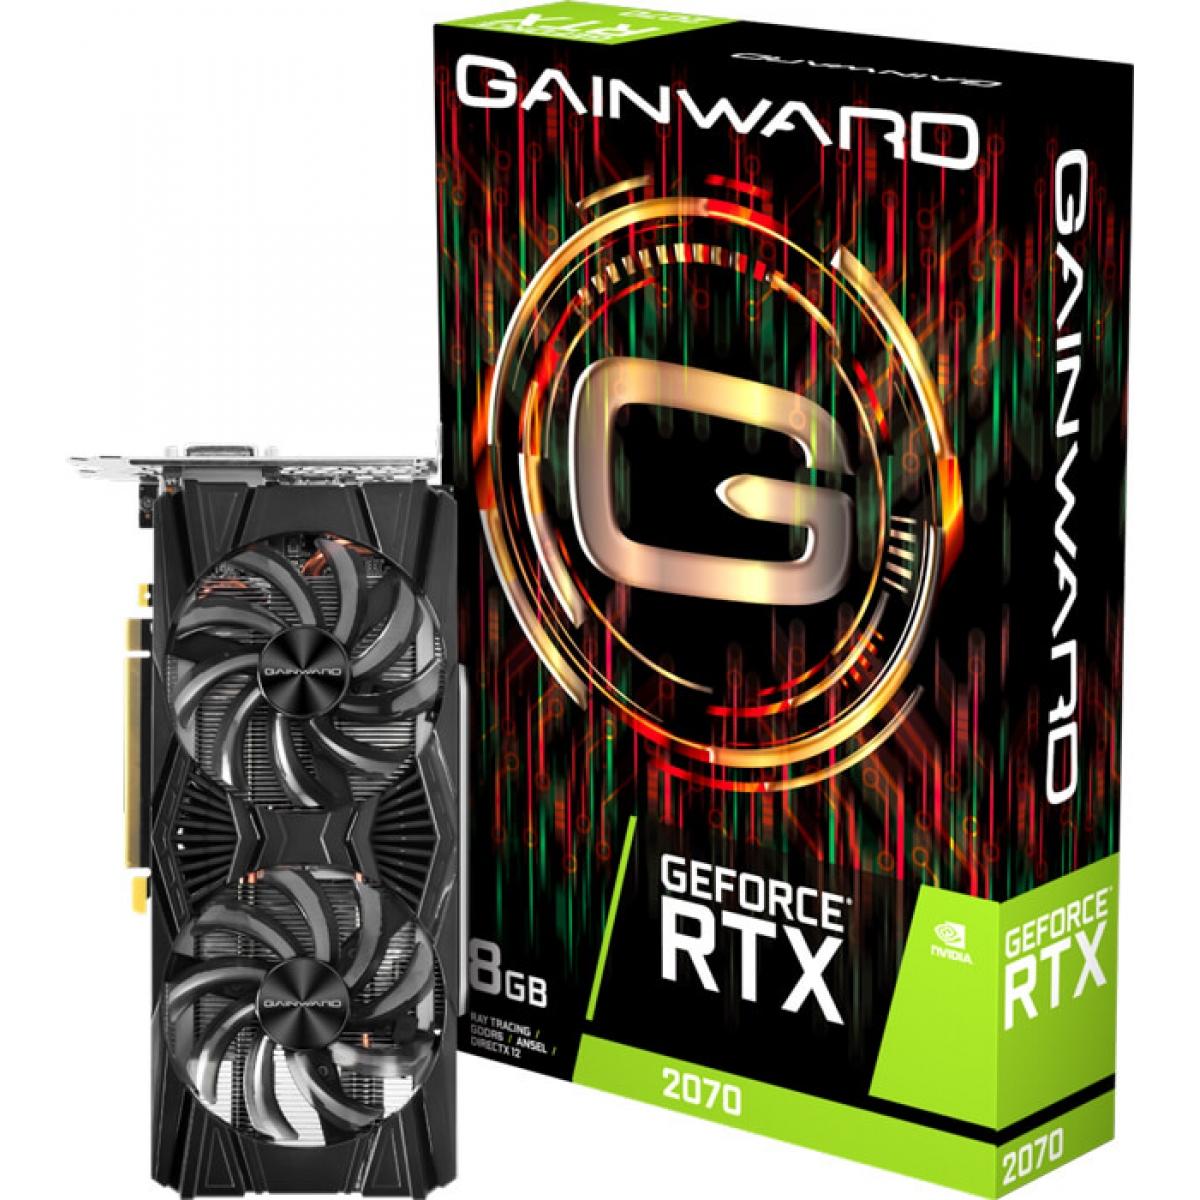 Placa De Vídeo Gainward Geforce RTX 2070 Dual Fan, 8GB GDDR6, 256Bit